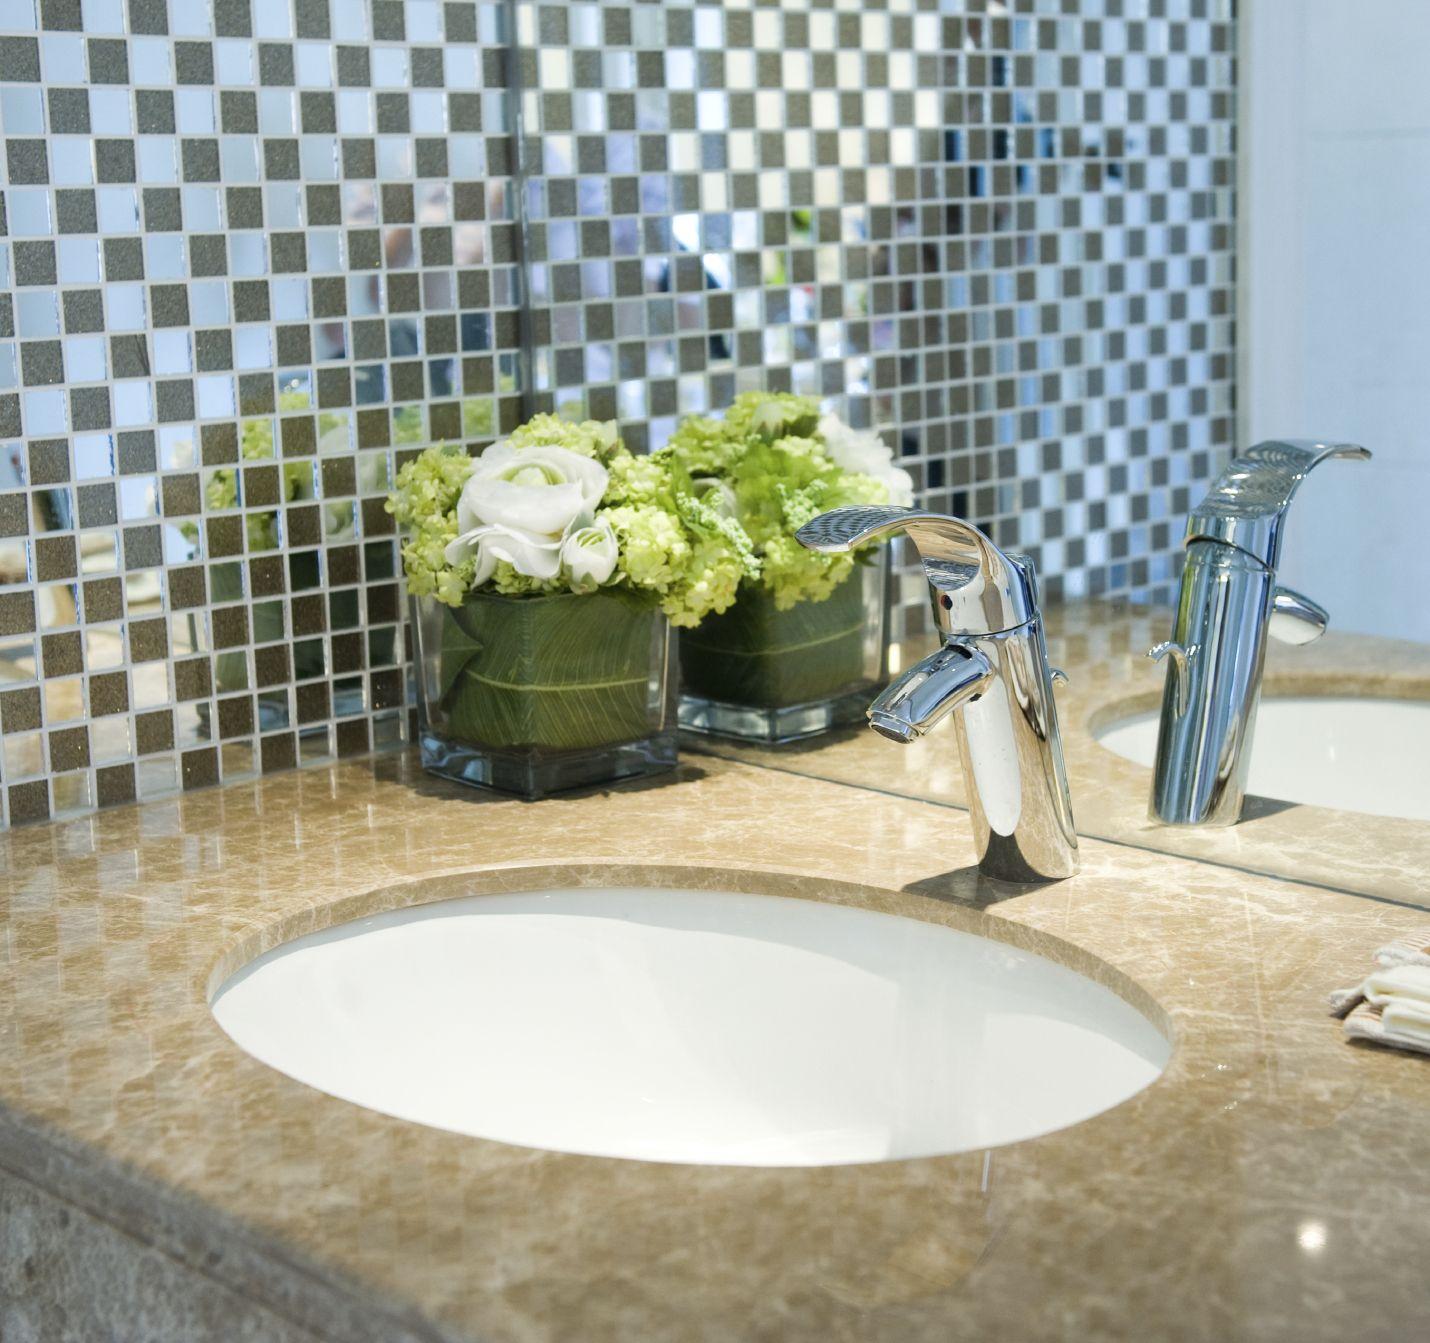 Bathroom sinks 101 spring cleaning checklist homemade